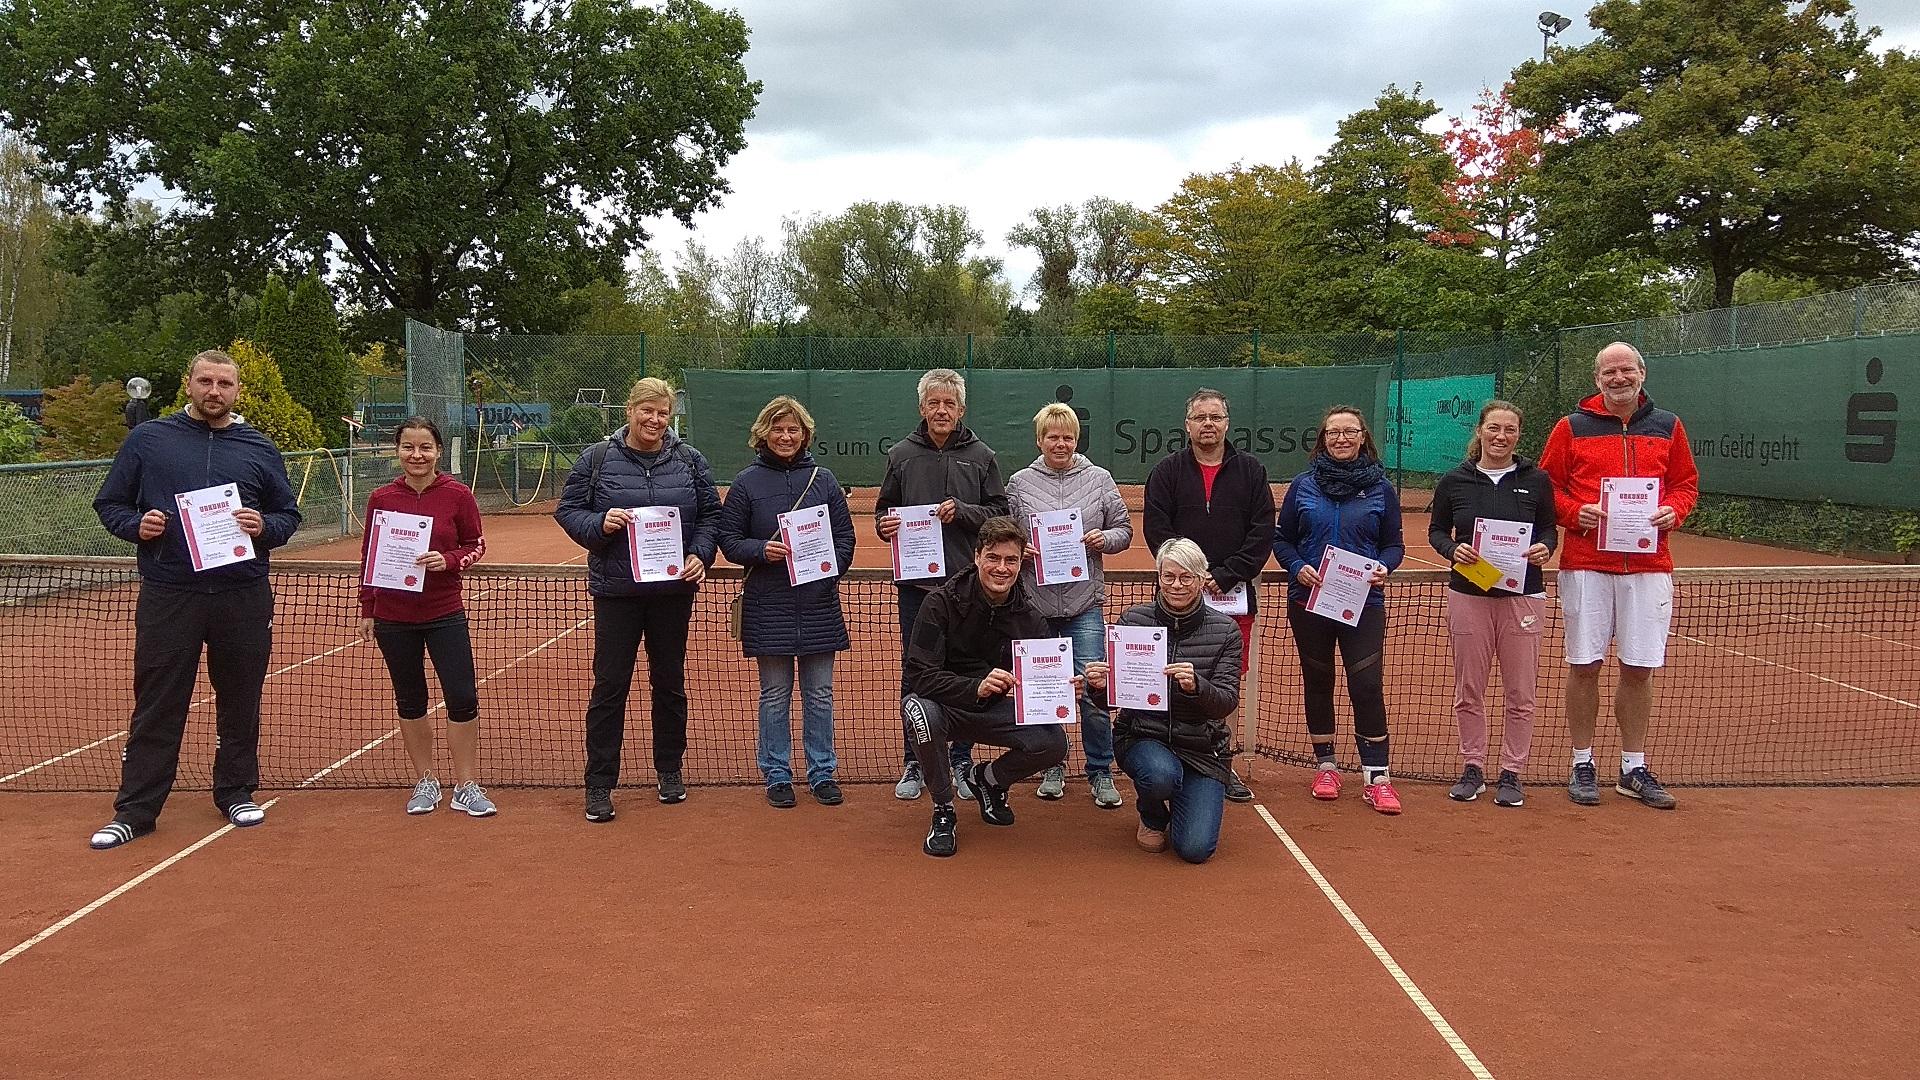 telekom-post-sv-bielefeld-tennisabteilung-vereinsmeisterschaften-2020-sieger-damen-einzel-nebenrunde+mixed-hauptrunde+mixed-nebenrunde-hp